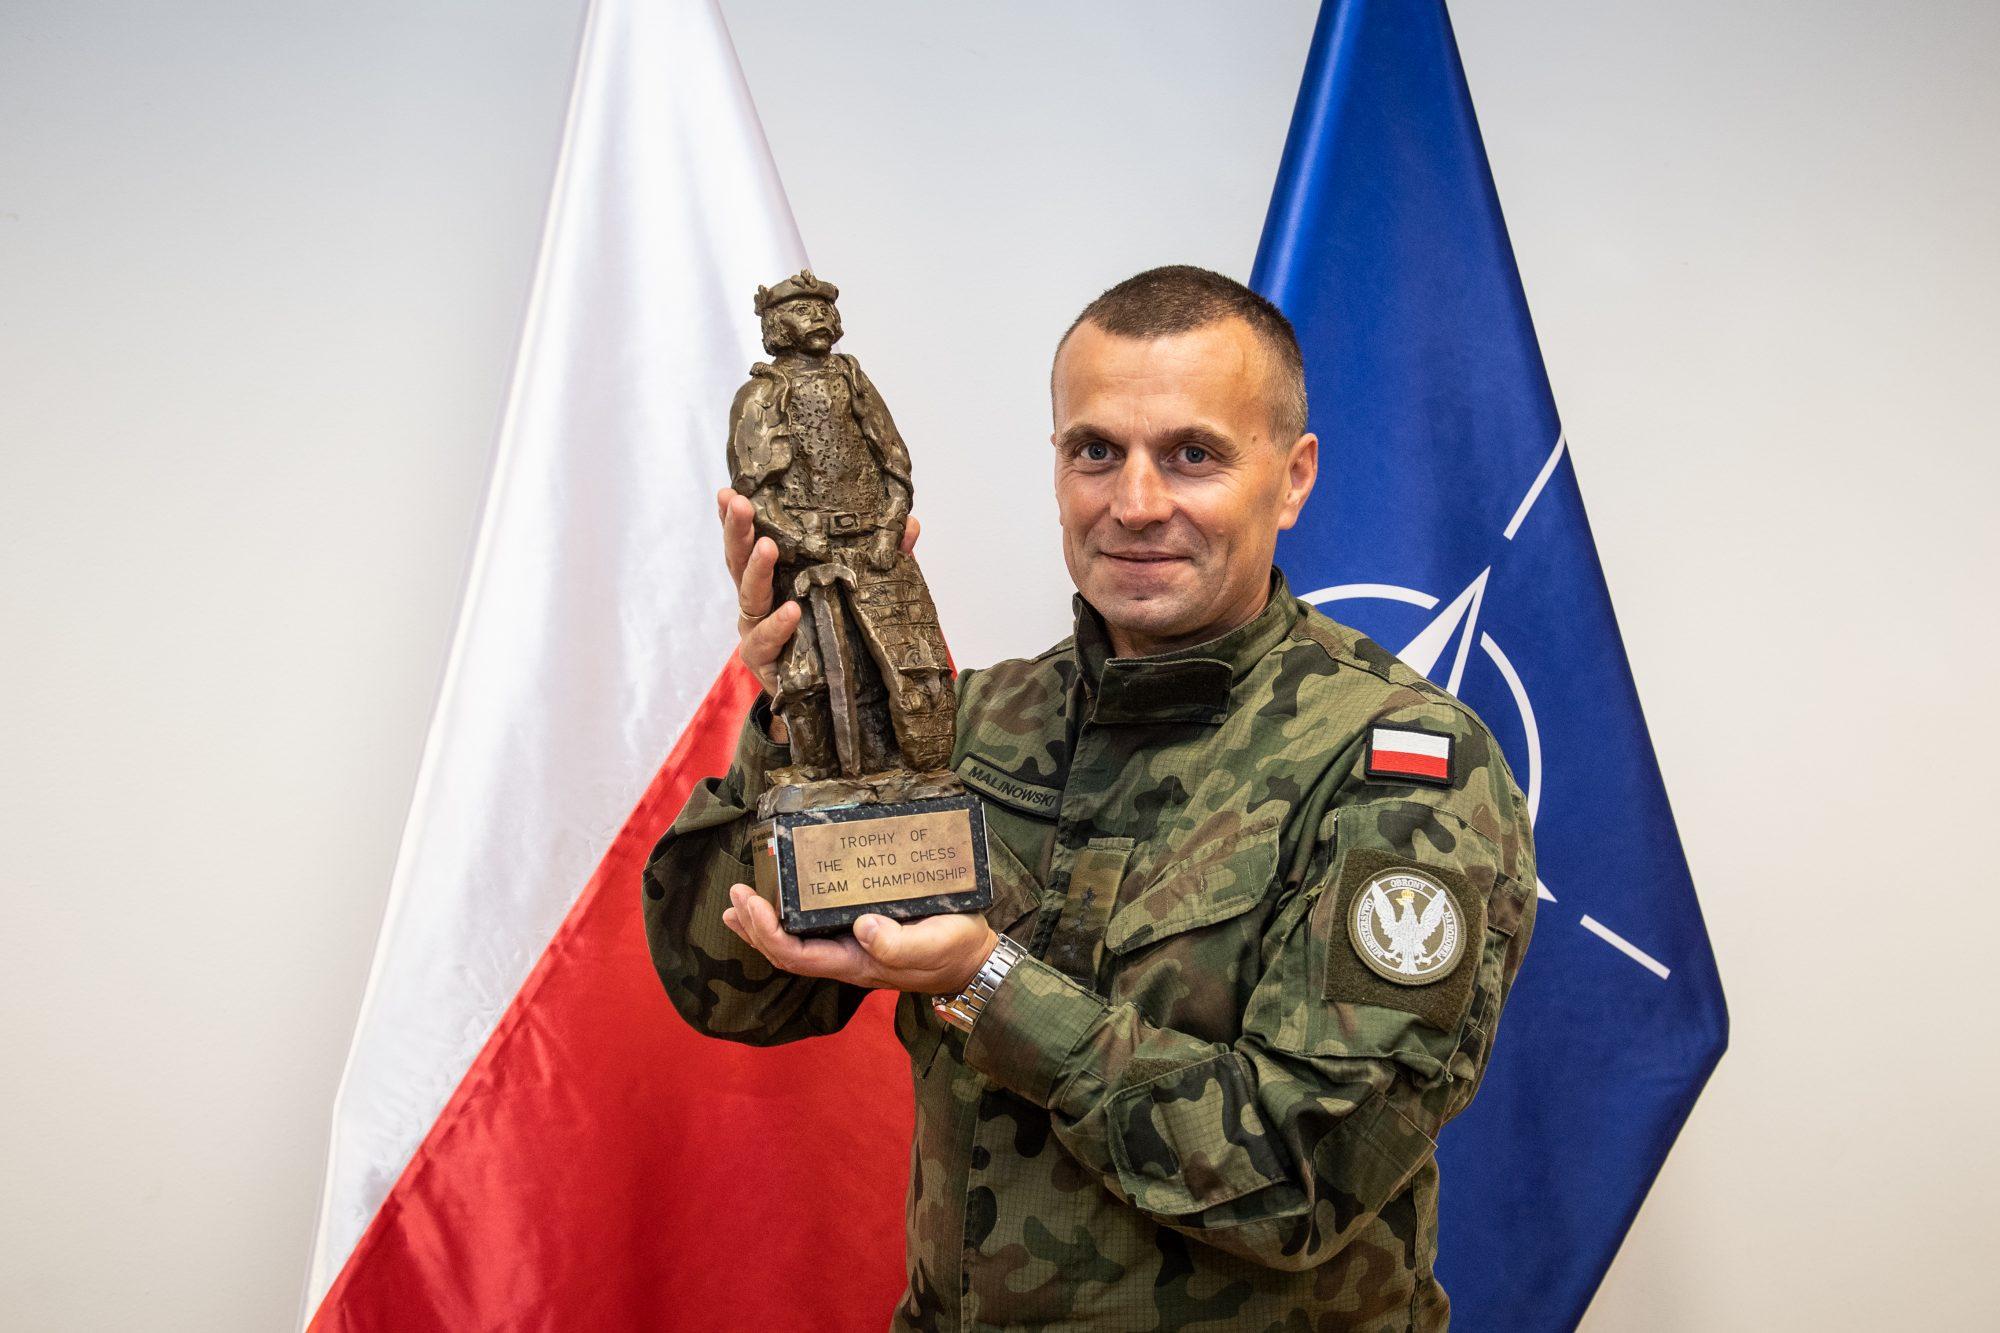 Tomasz Malinowski, NATO Chess